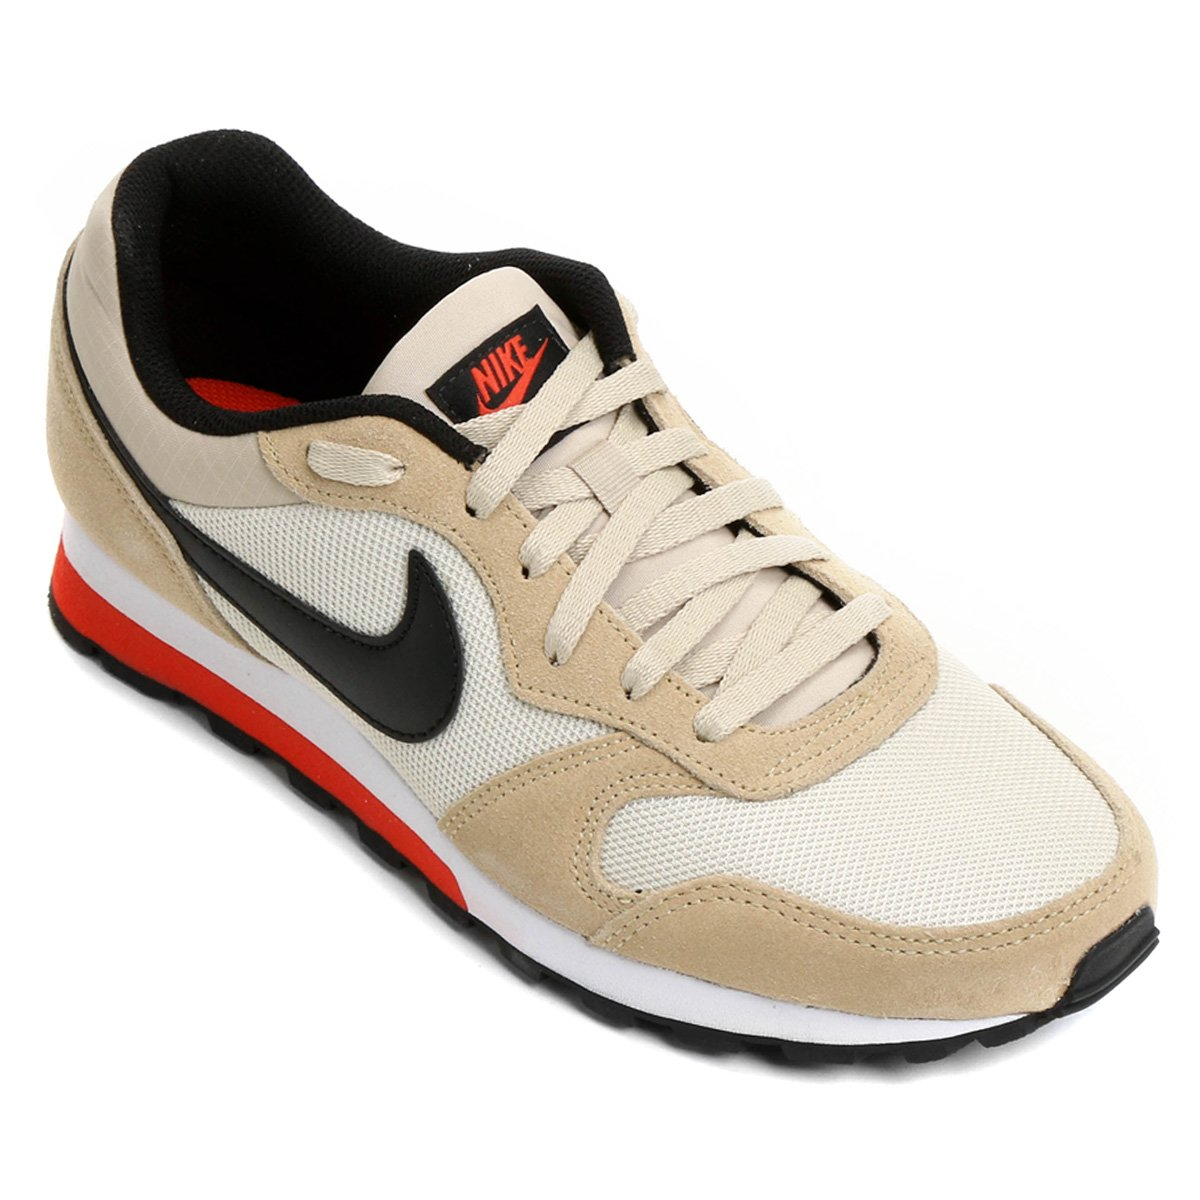 b4cdfe40ba Tênis Nike Md Runner 2 Masculino - Areia e Laranja - Compre Agora ...